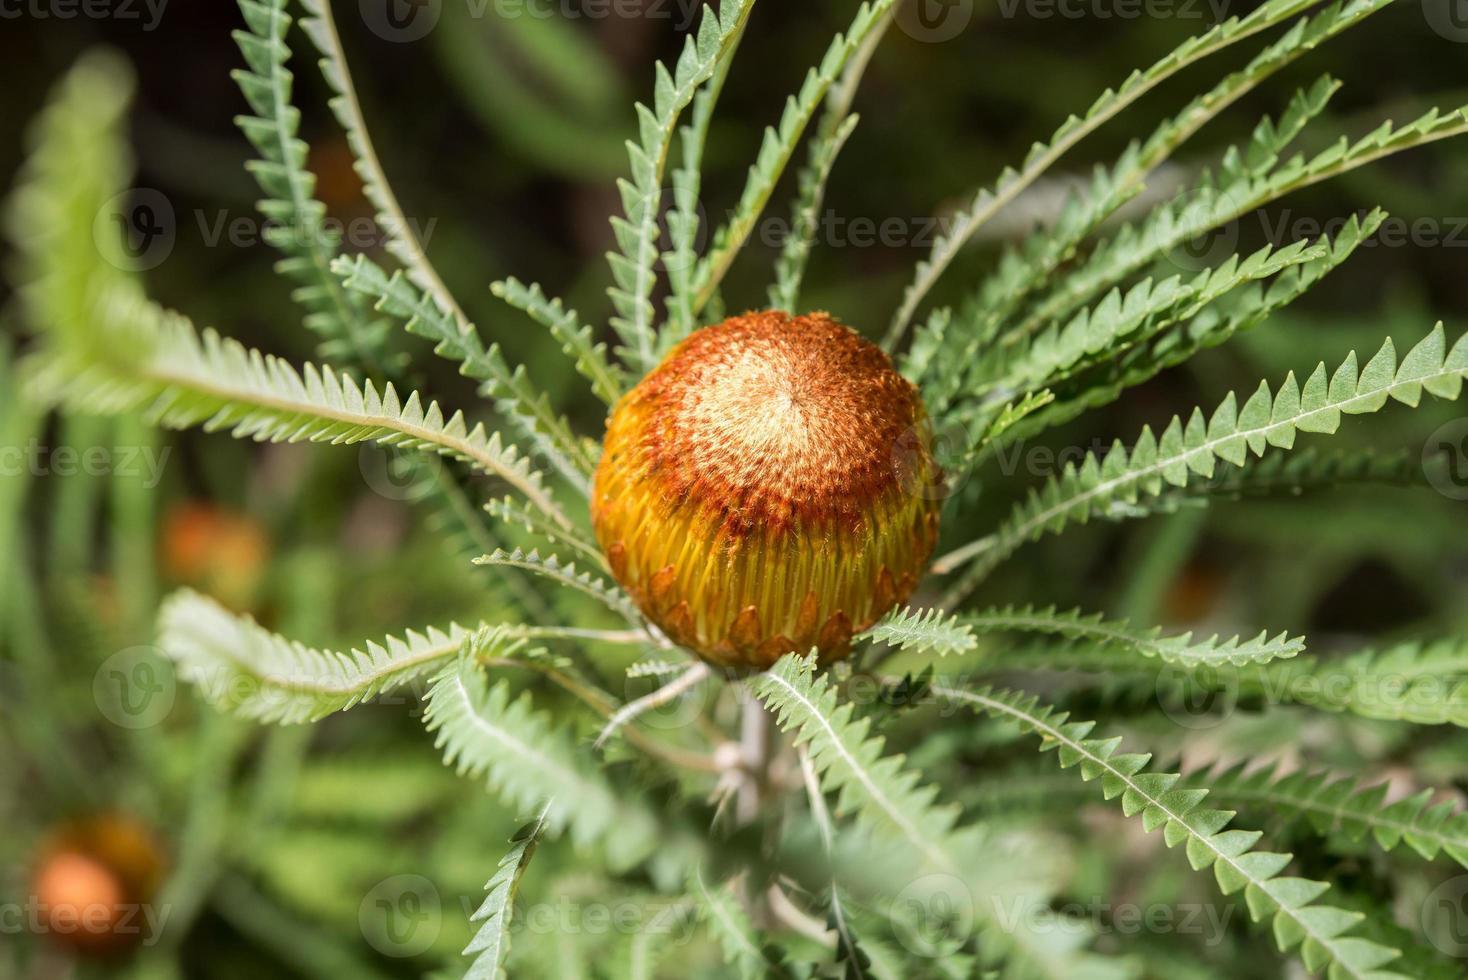 australië bush flora bloemen detail banksia bloem foto